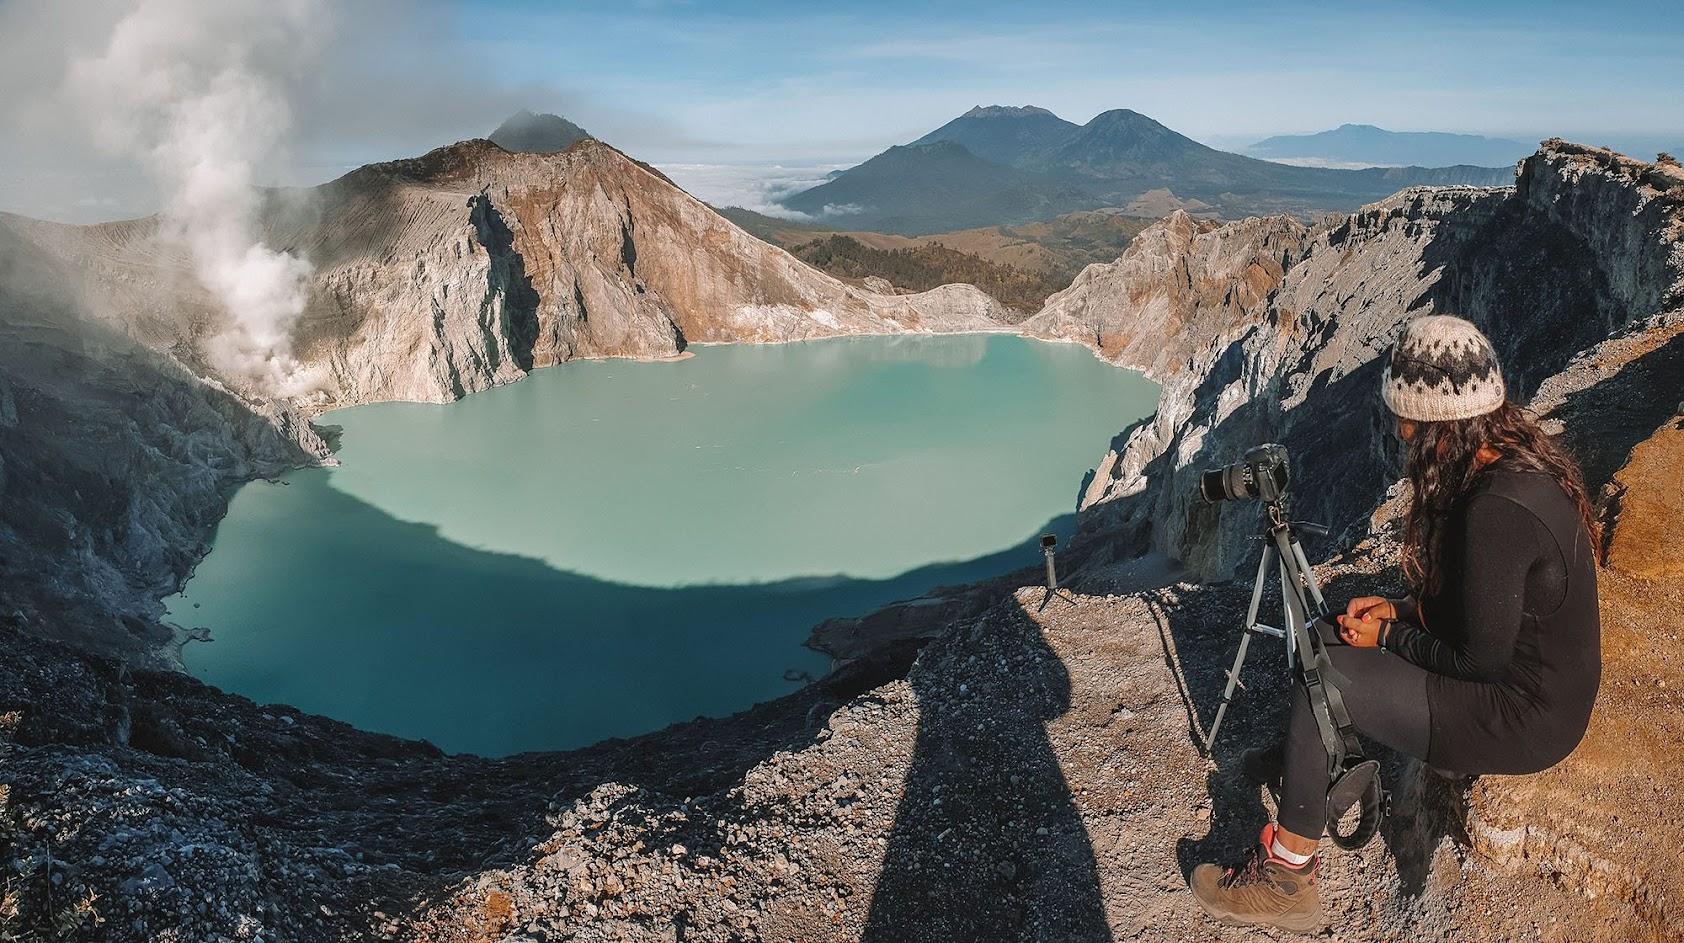 DIAS 37 a 42 – Na CRATERA DE IJEN, convivendo com as chamas azuis e os mineiros de enxofre